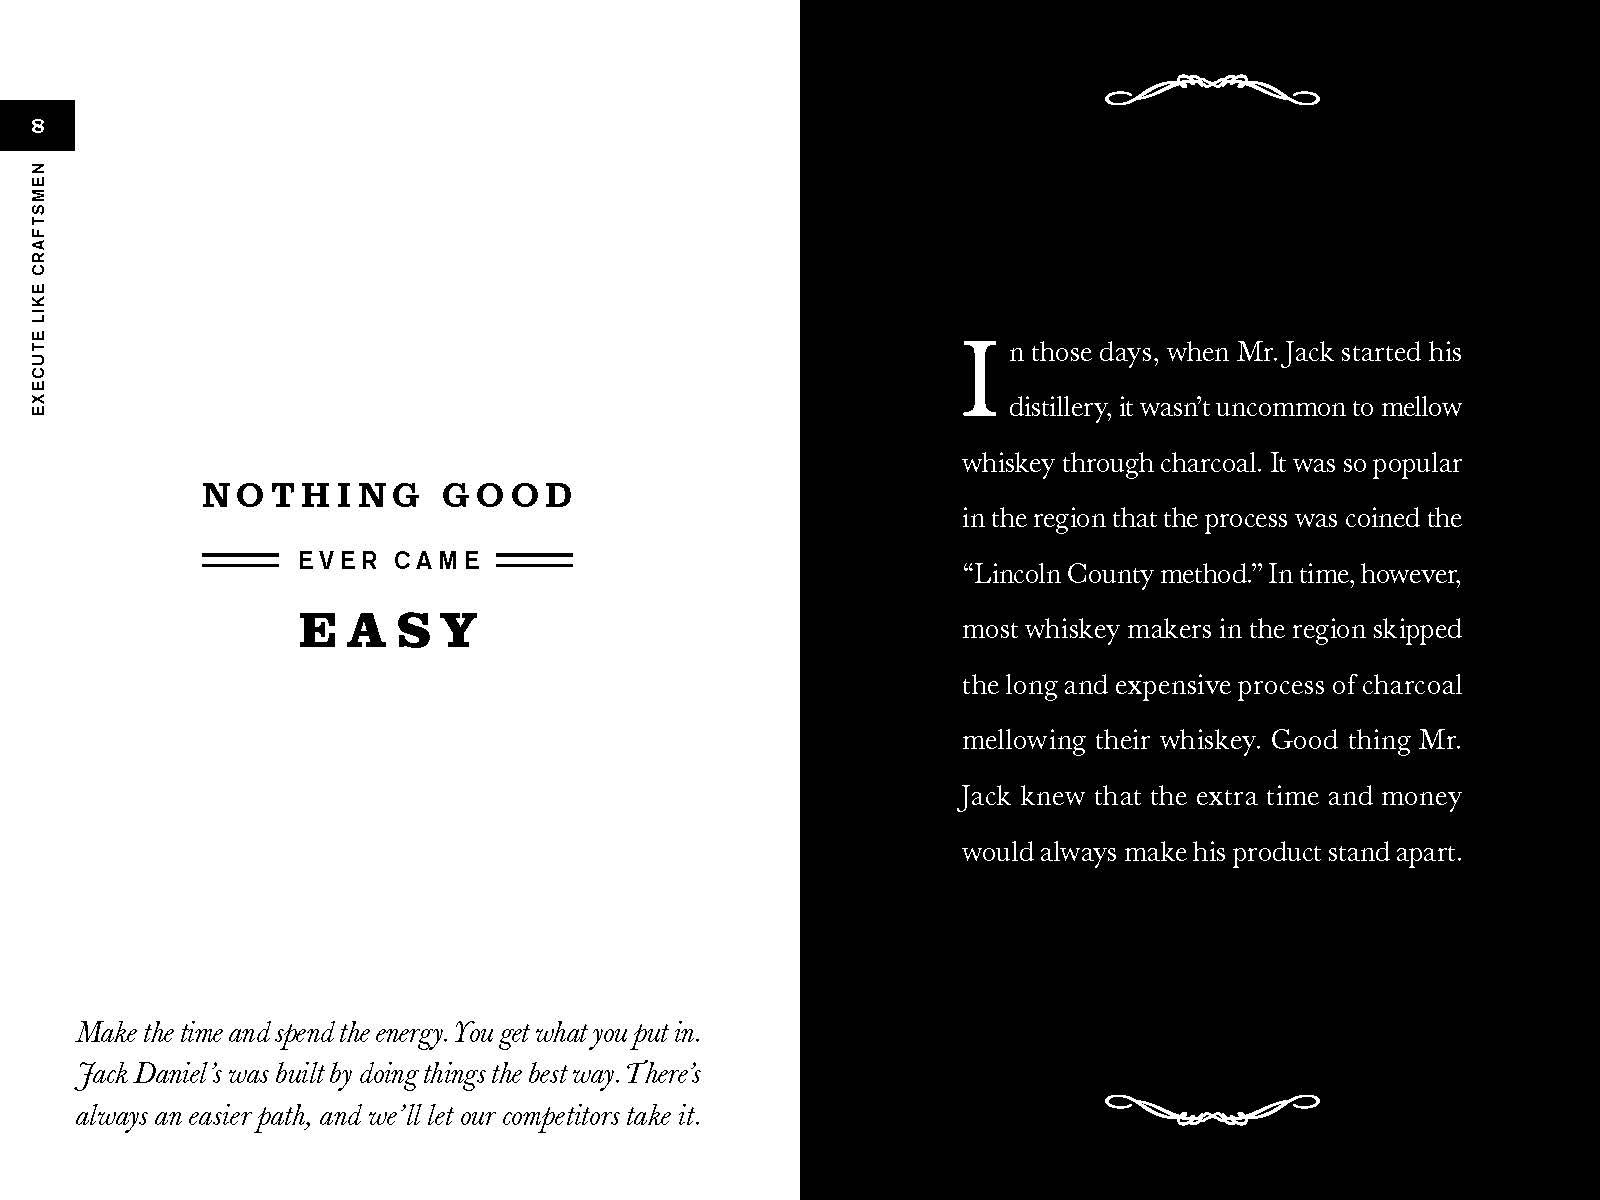 Jack Daniel's Guiding Principles 2012_Page_08.jpg